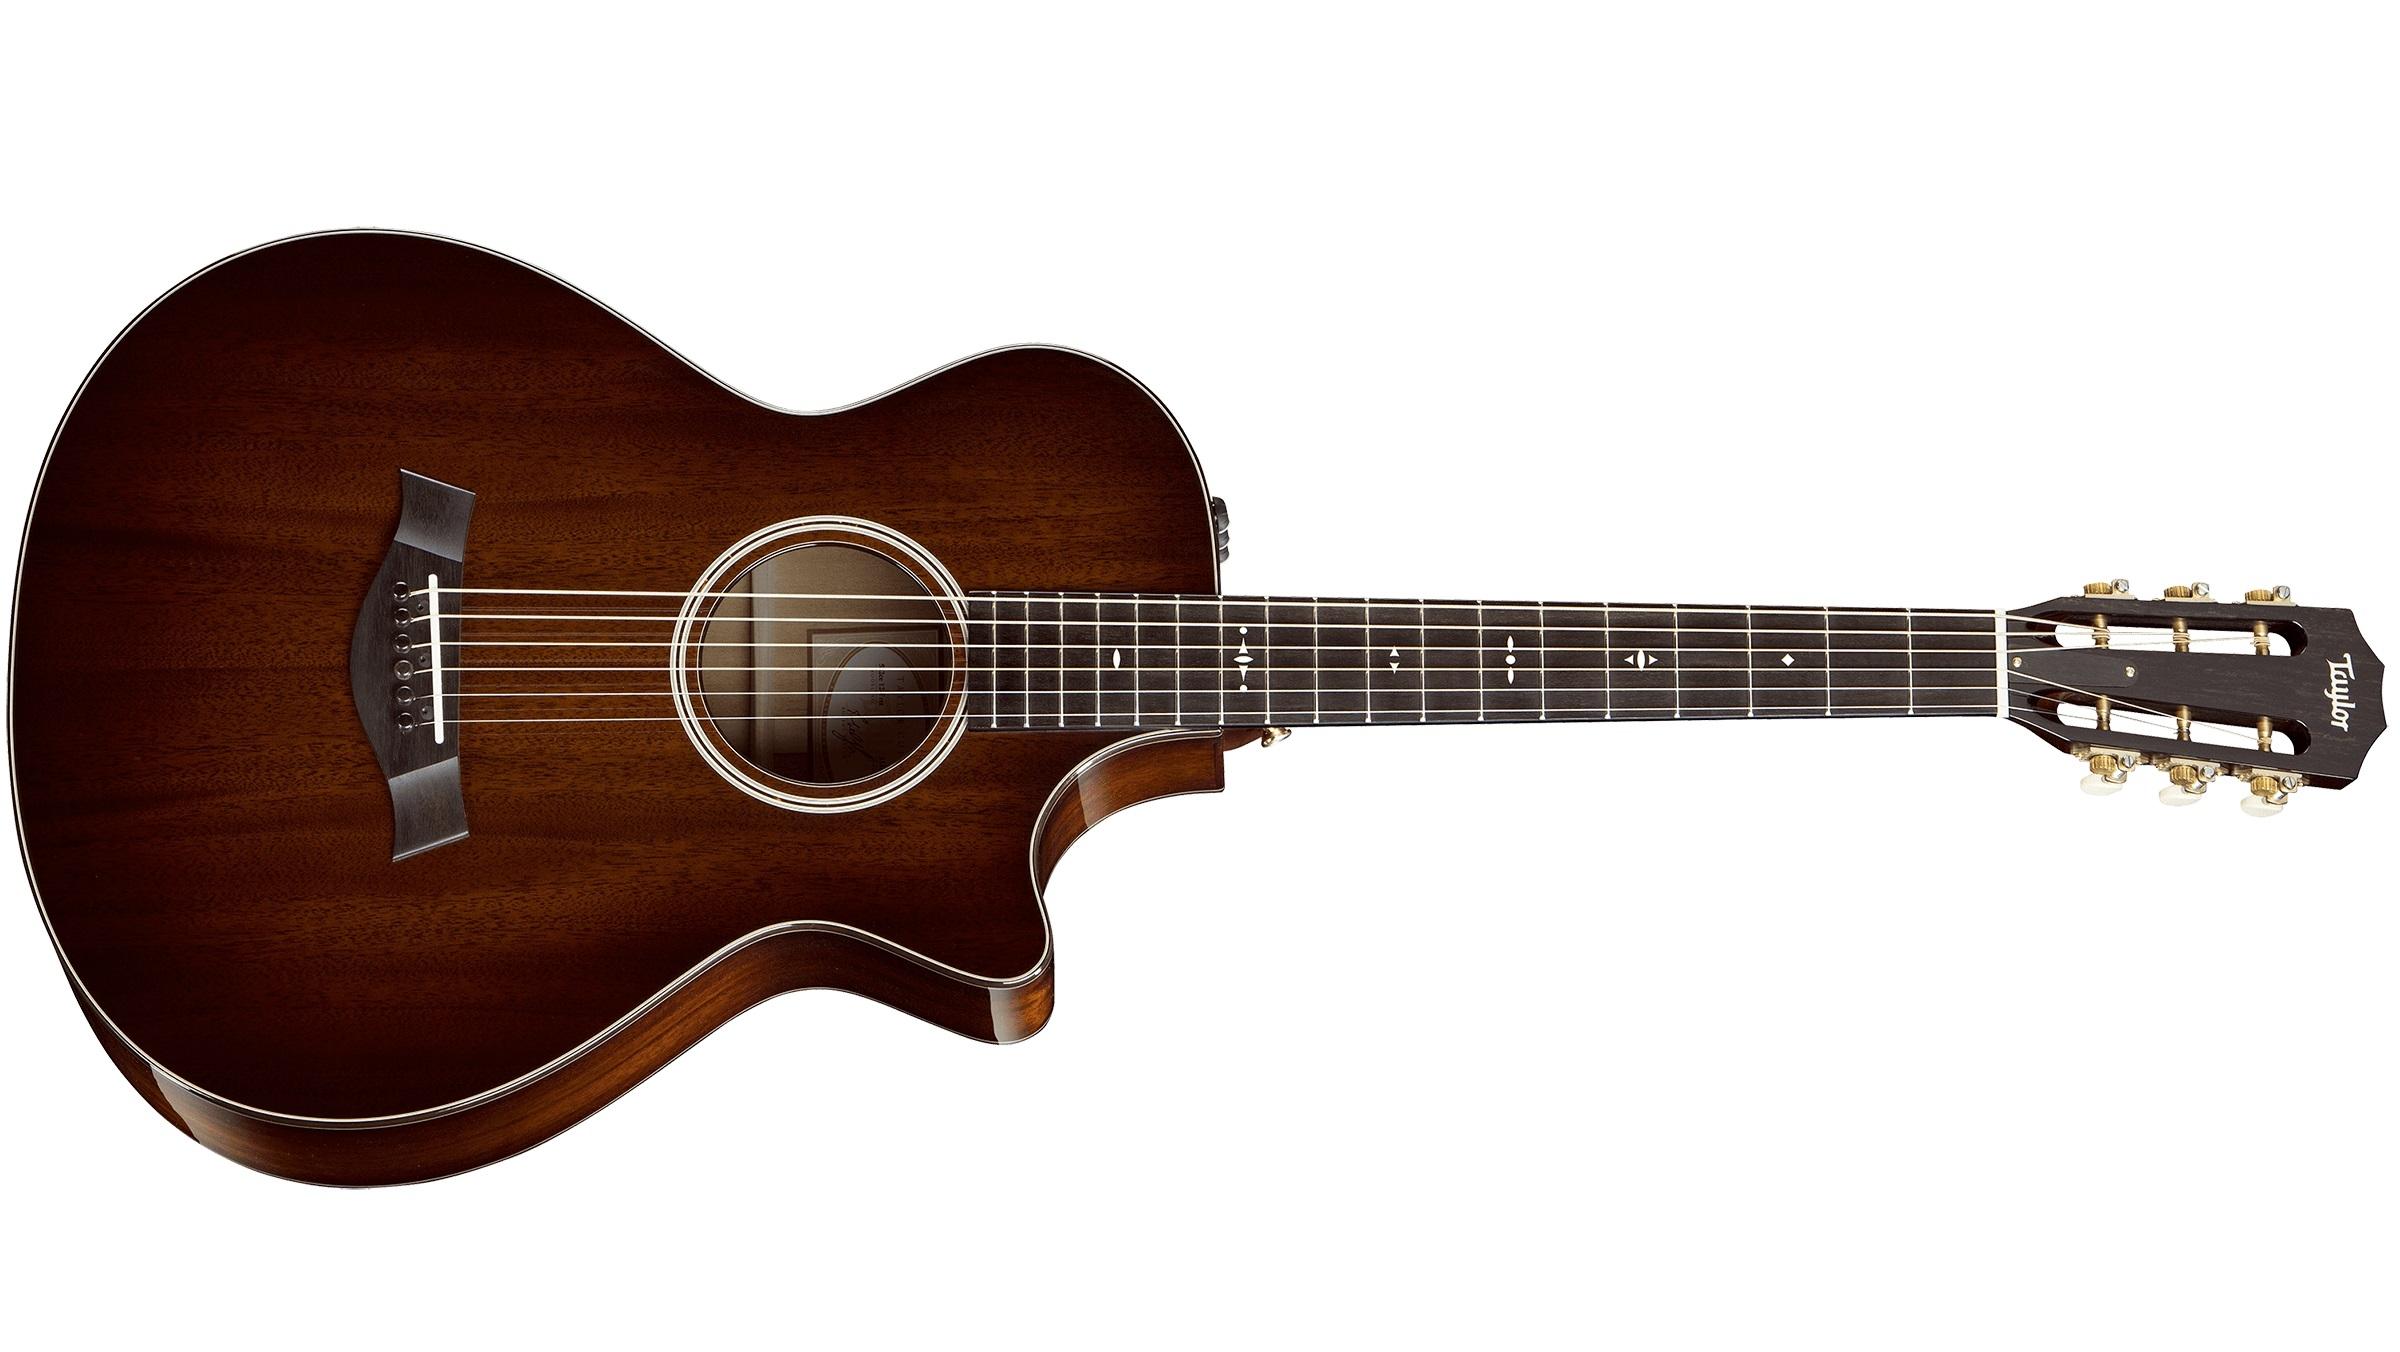 12 Fret Grand Concert Electro Acoustic Guitar Mah: Acoustic Guitar